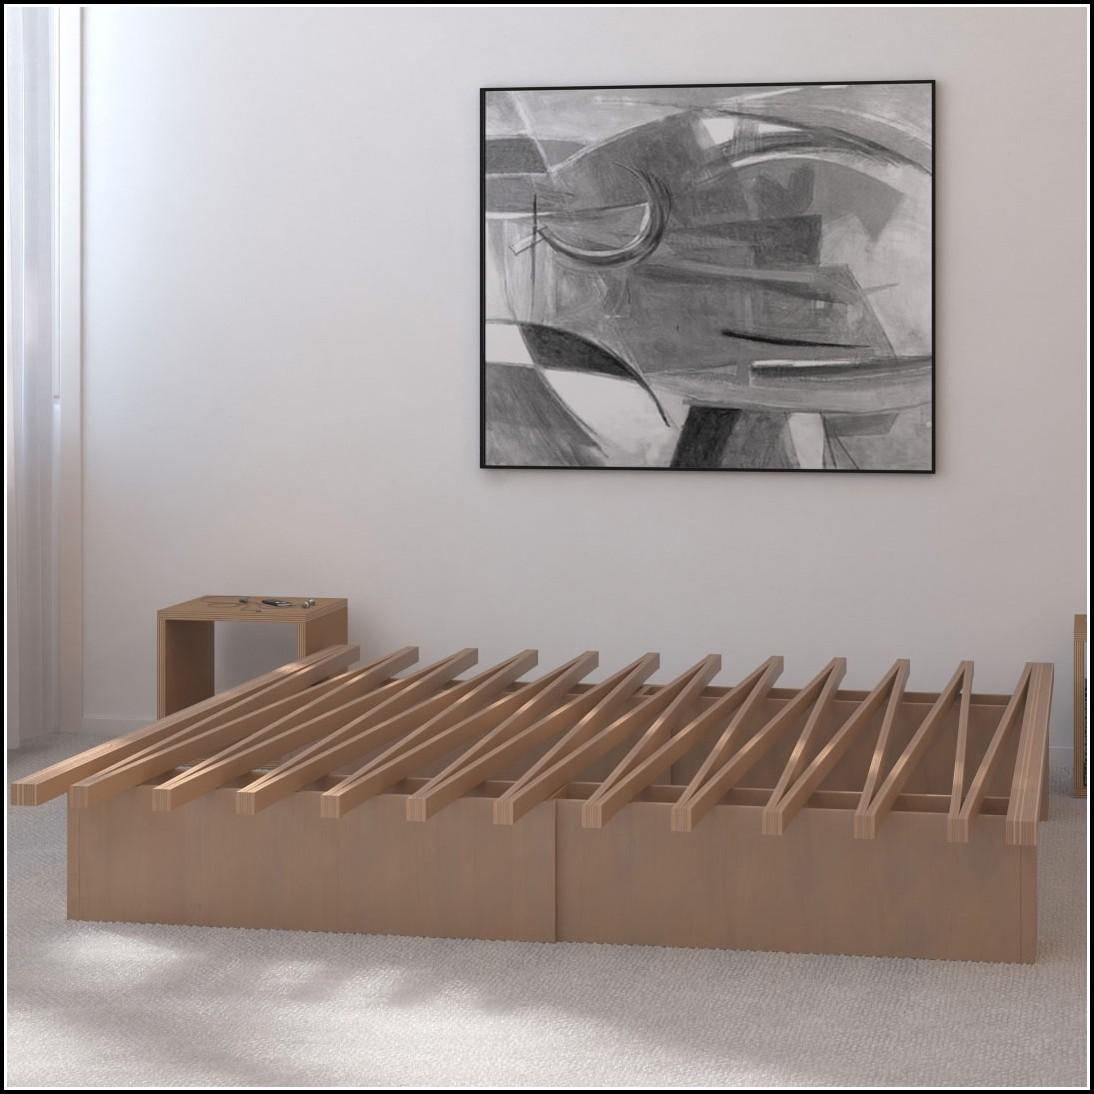 Full Size of Tojo V Bett Test Lieg Bewertung Bett  Matratzen Selber Bauen System Erfahrungen Gestell Gebraucht Kaufen Preisvergleich Erfahrung V Bett Bettgestell Bett Tojo V Bett